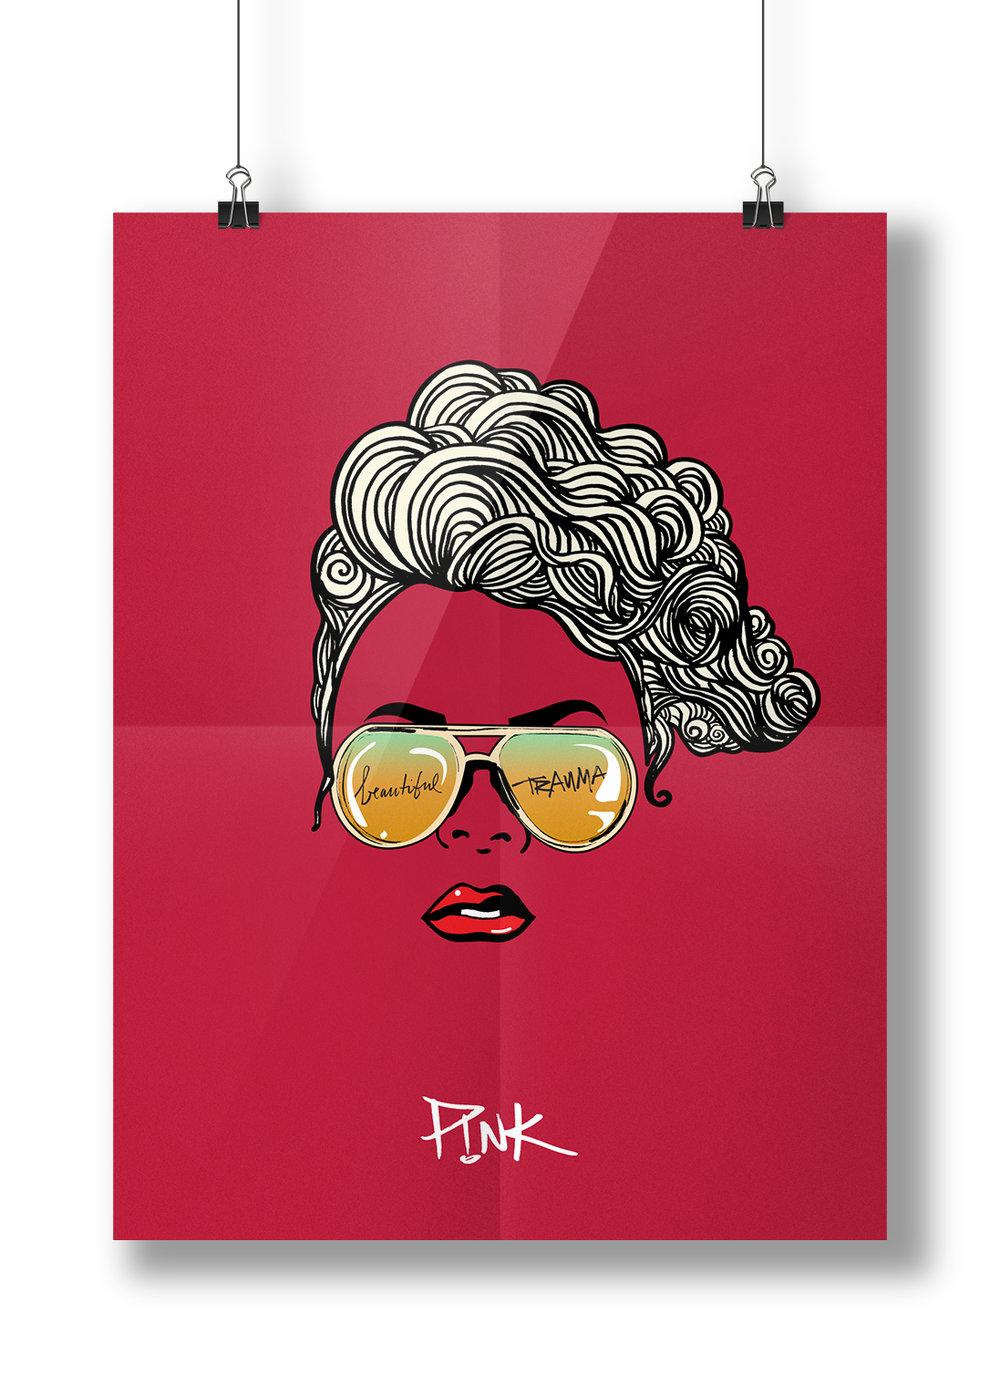 Pink_Poster.jpg